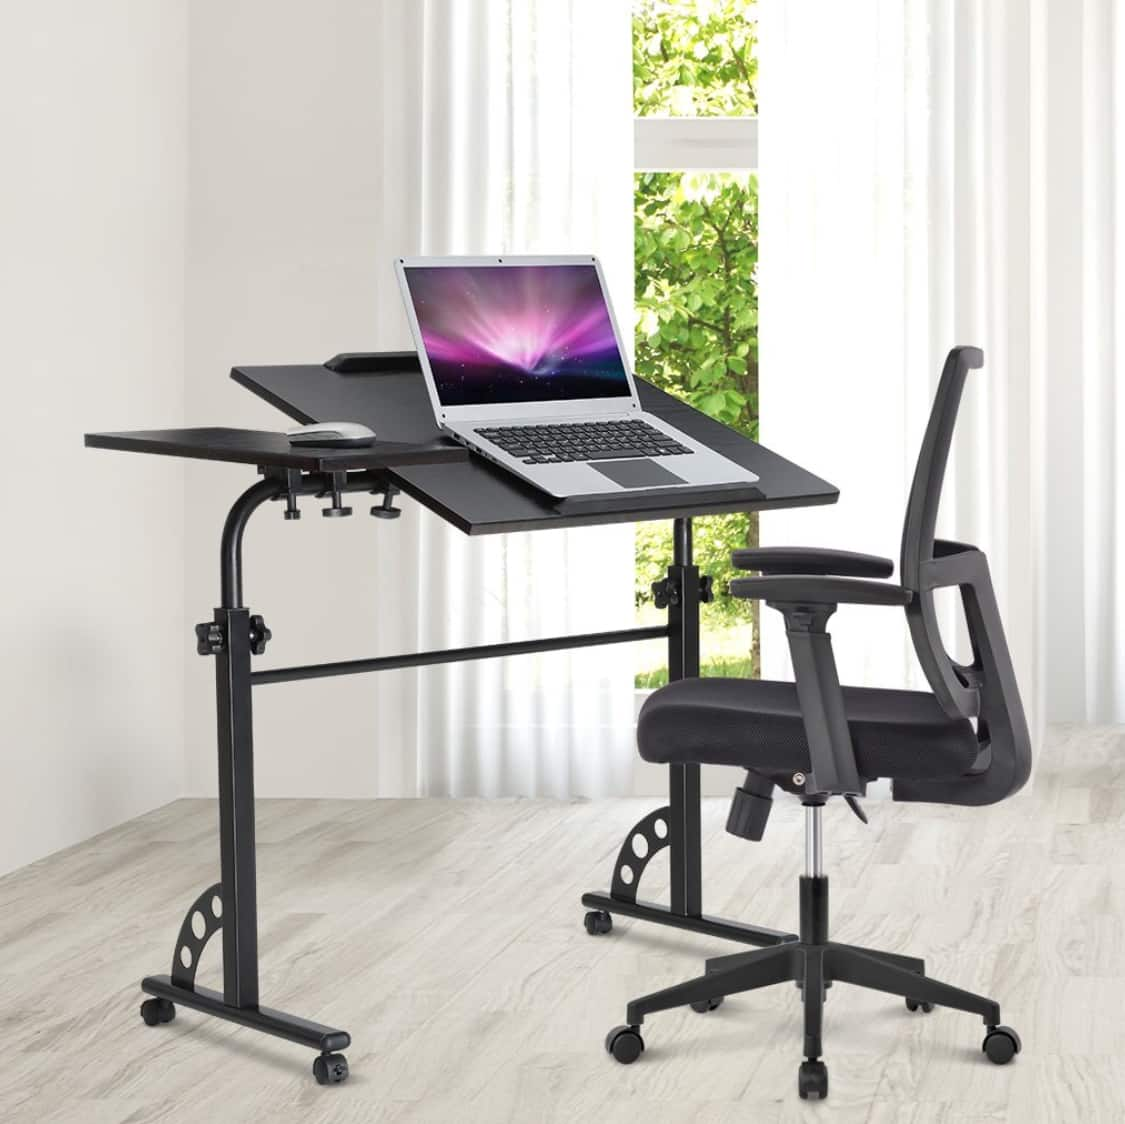 Portable Adjustable Laptop Desk $37.09 @Amazon + FS